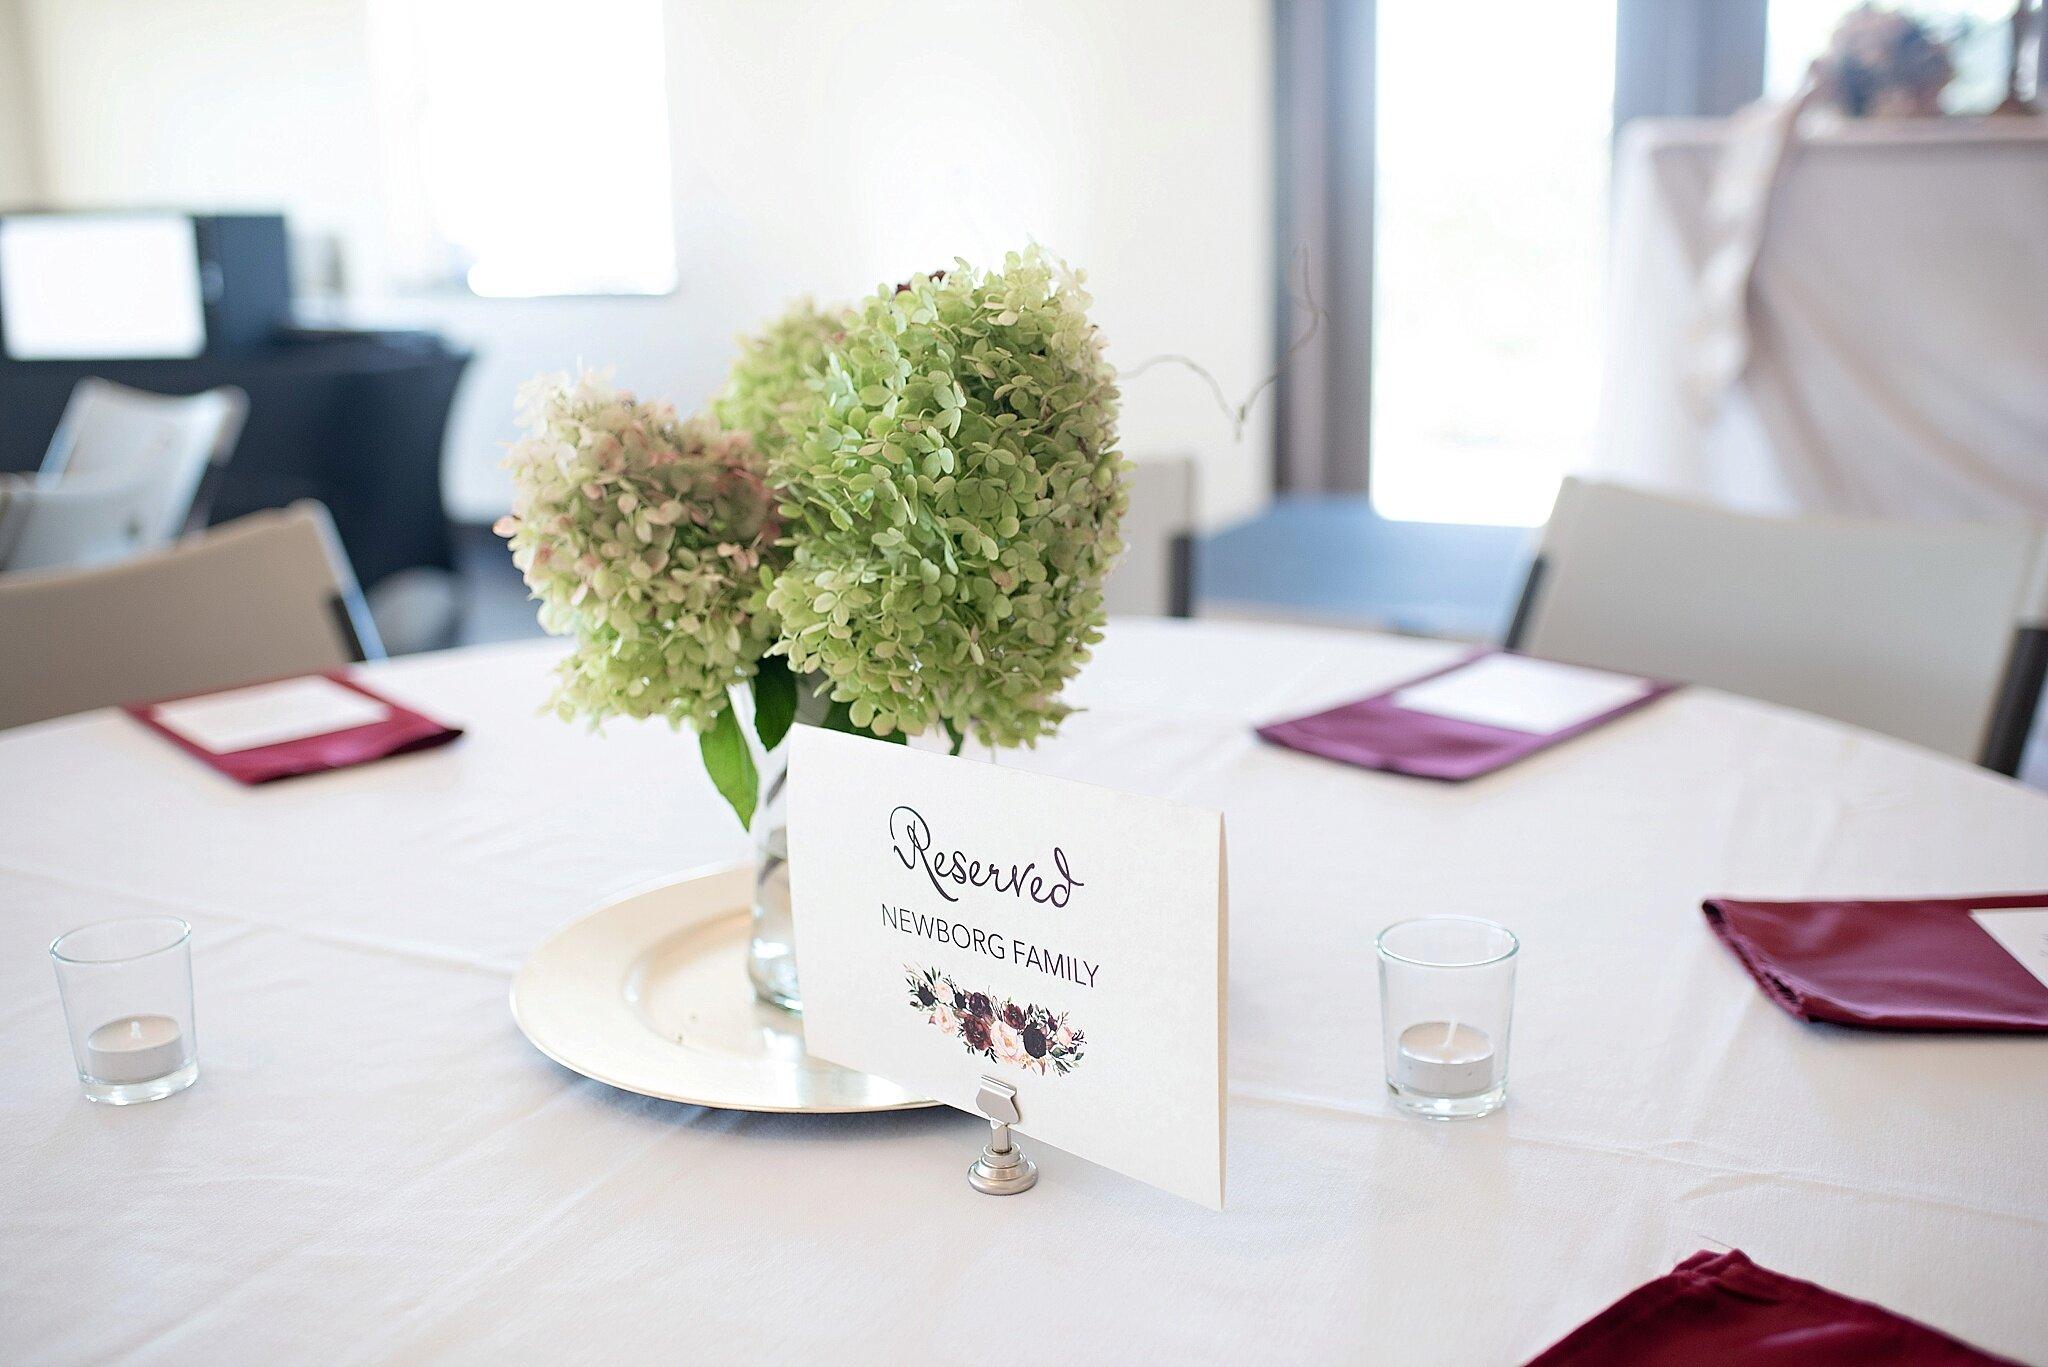 calico skies vineyard and winery wedding